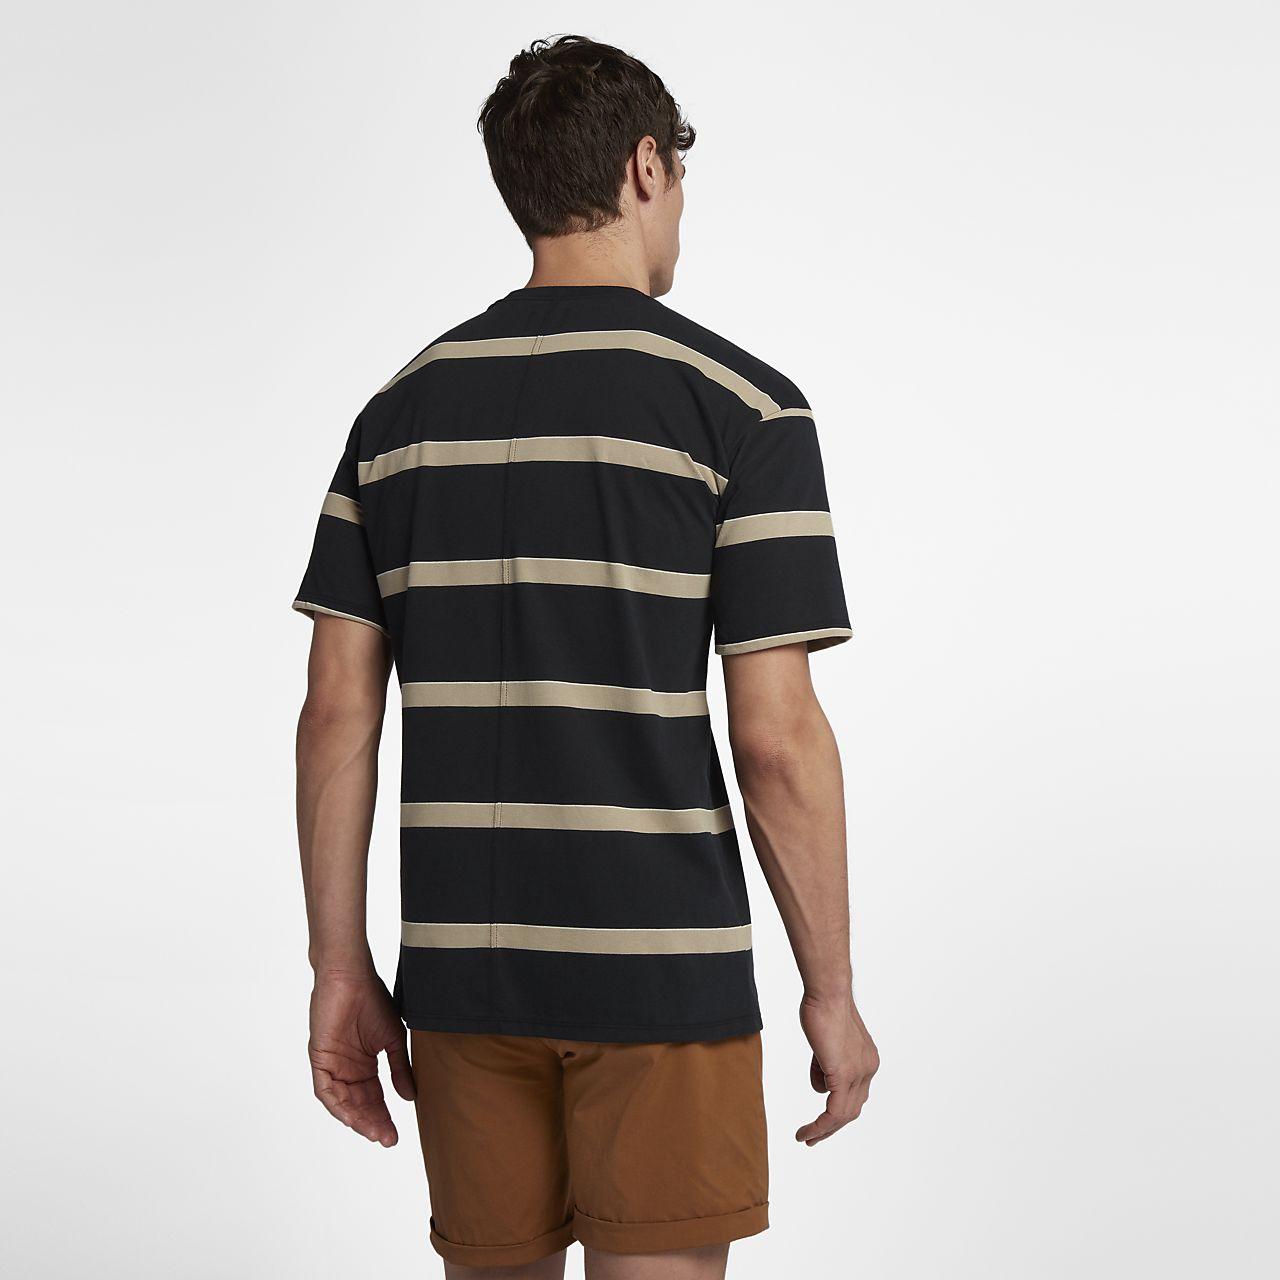 fed25d5b4e45 Hurley Dri-FIT Dunes Crew Men s T-Shirt. Nike.com